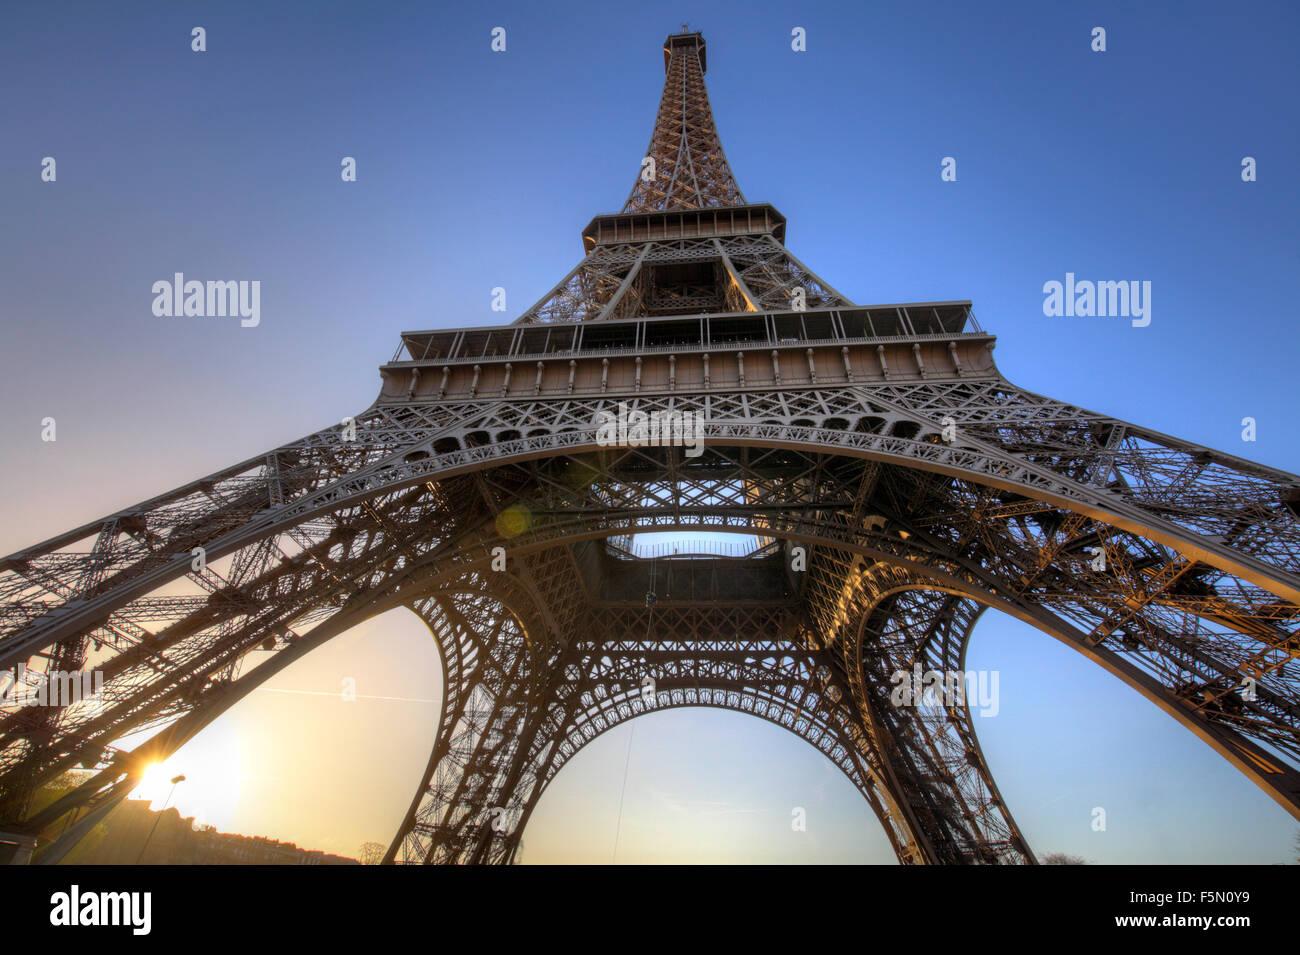 Eiffelturm bei Sonnenaufgang, Paris, Frankreich Stockbild